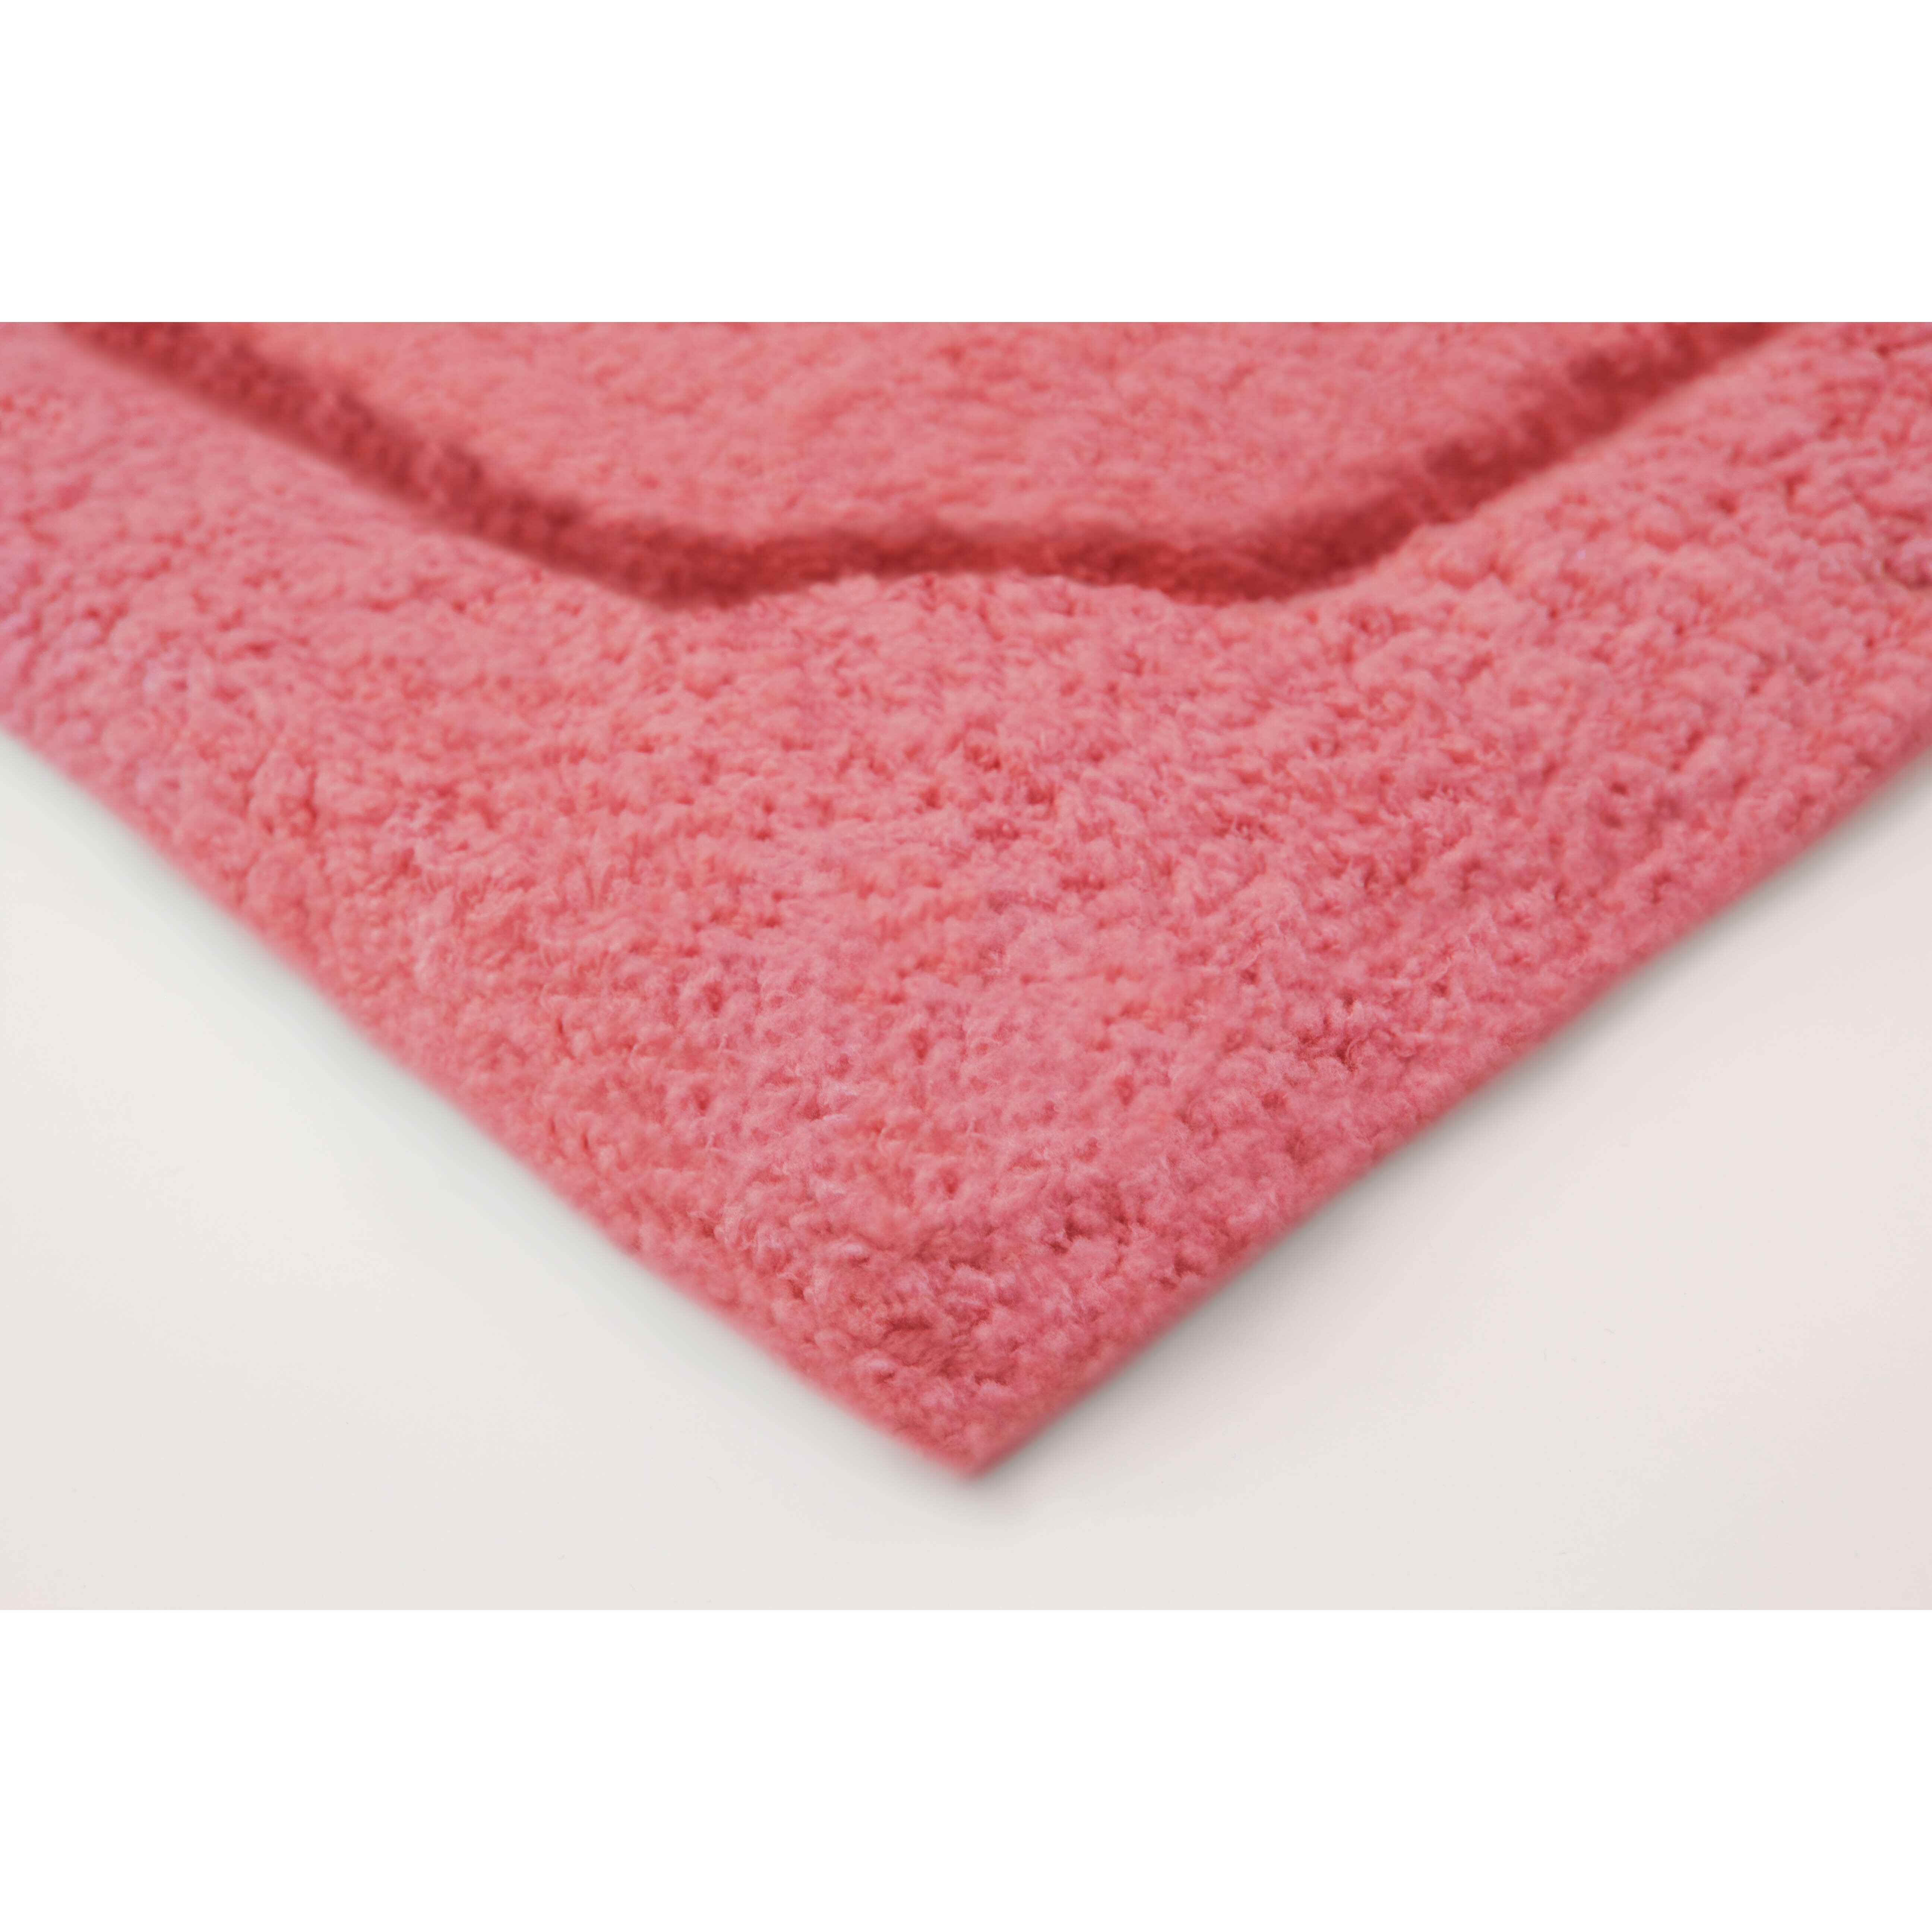 Plush Bathroom Rugs Red Bath Mat Free Shipping Red Rectangle Font B Bath B Font Font